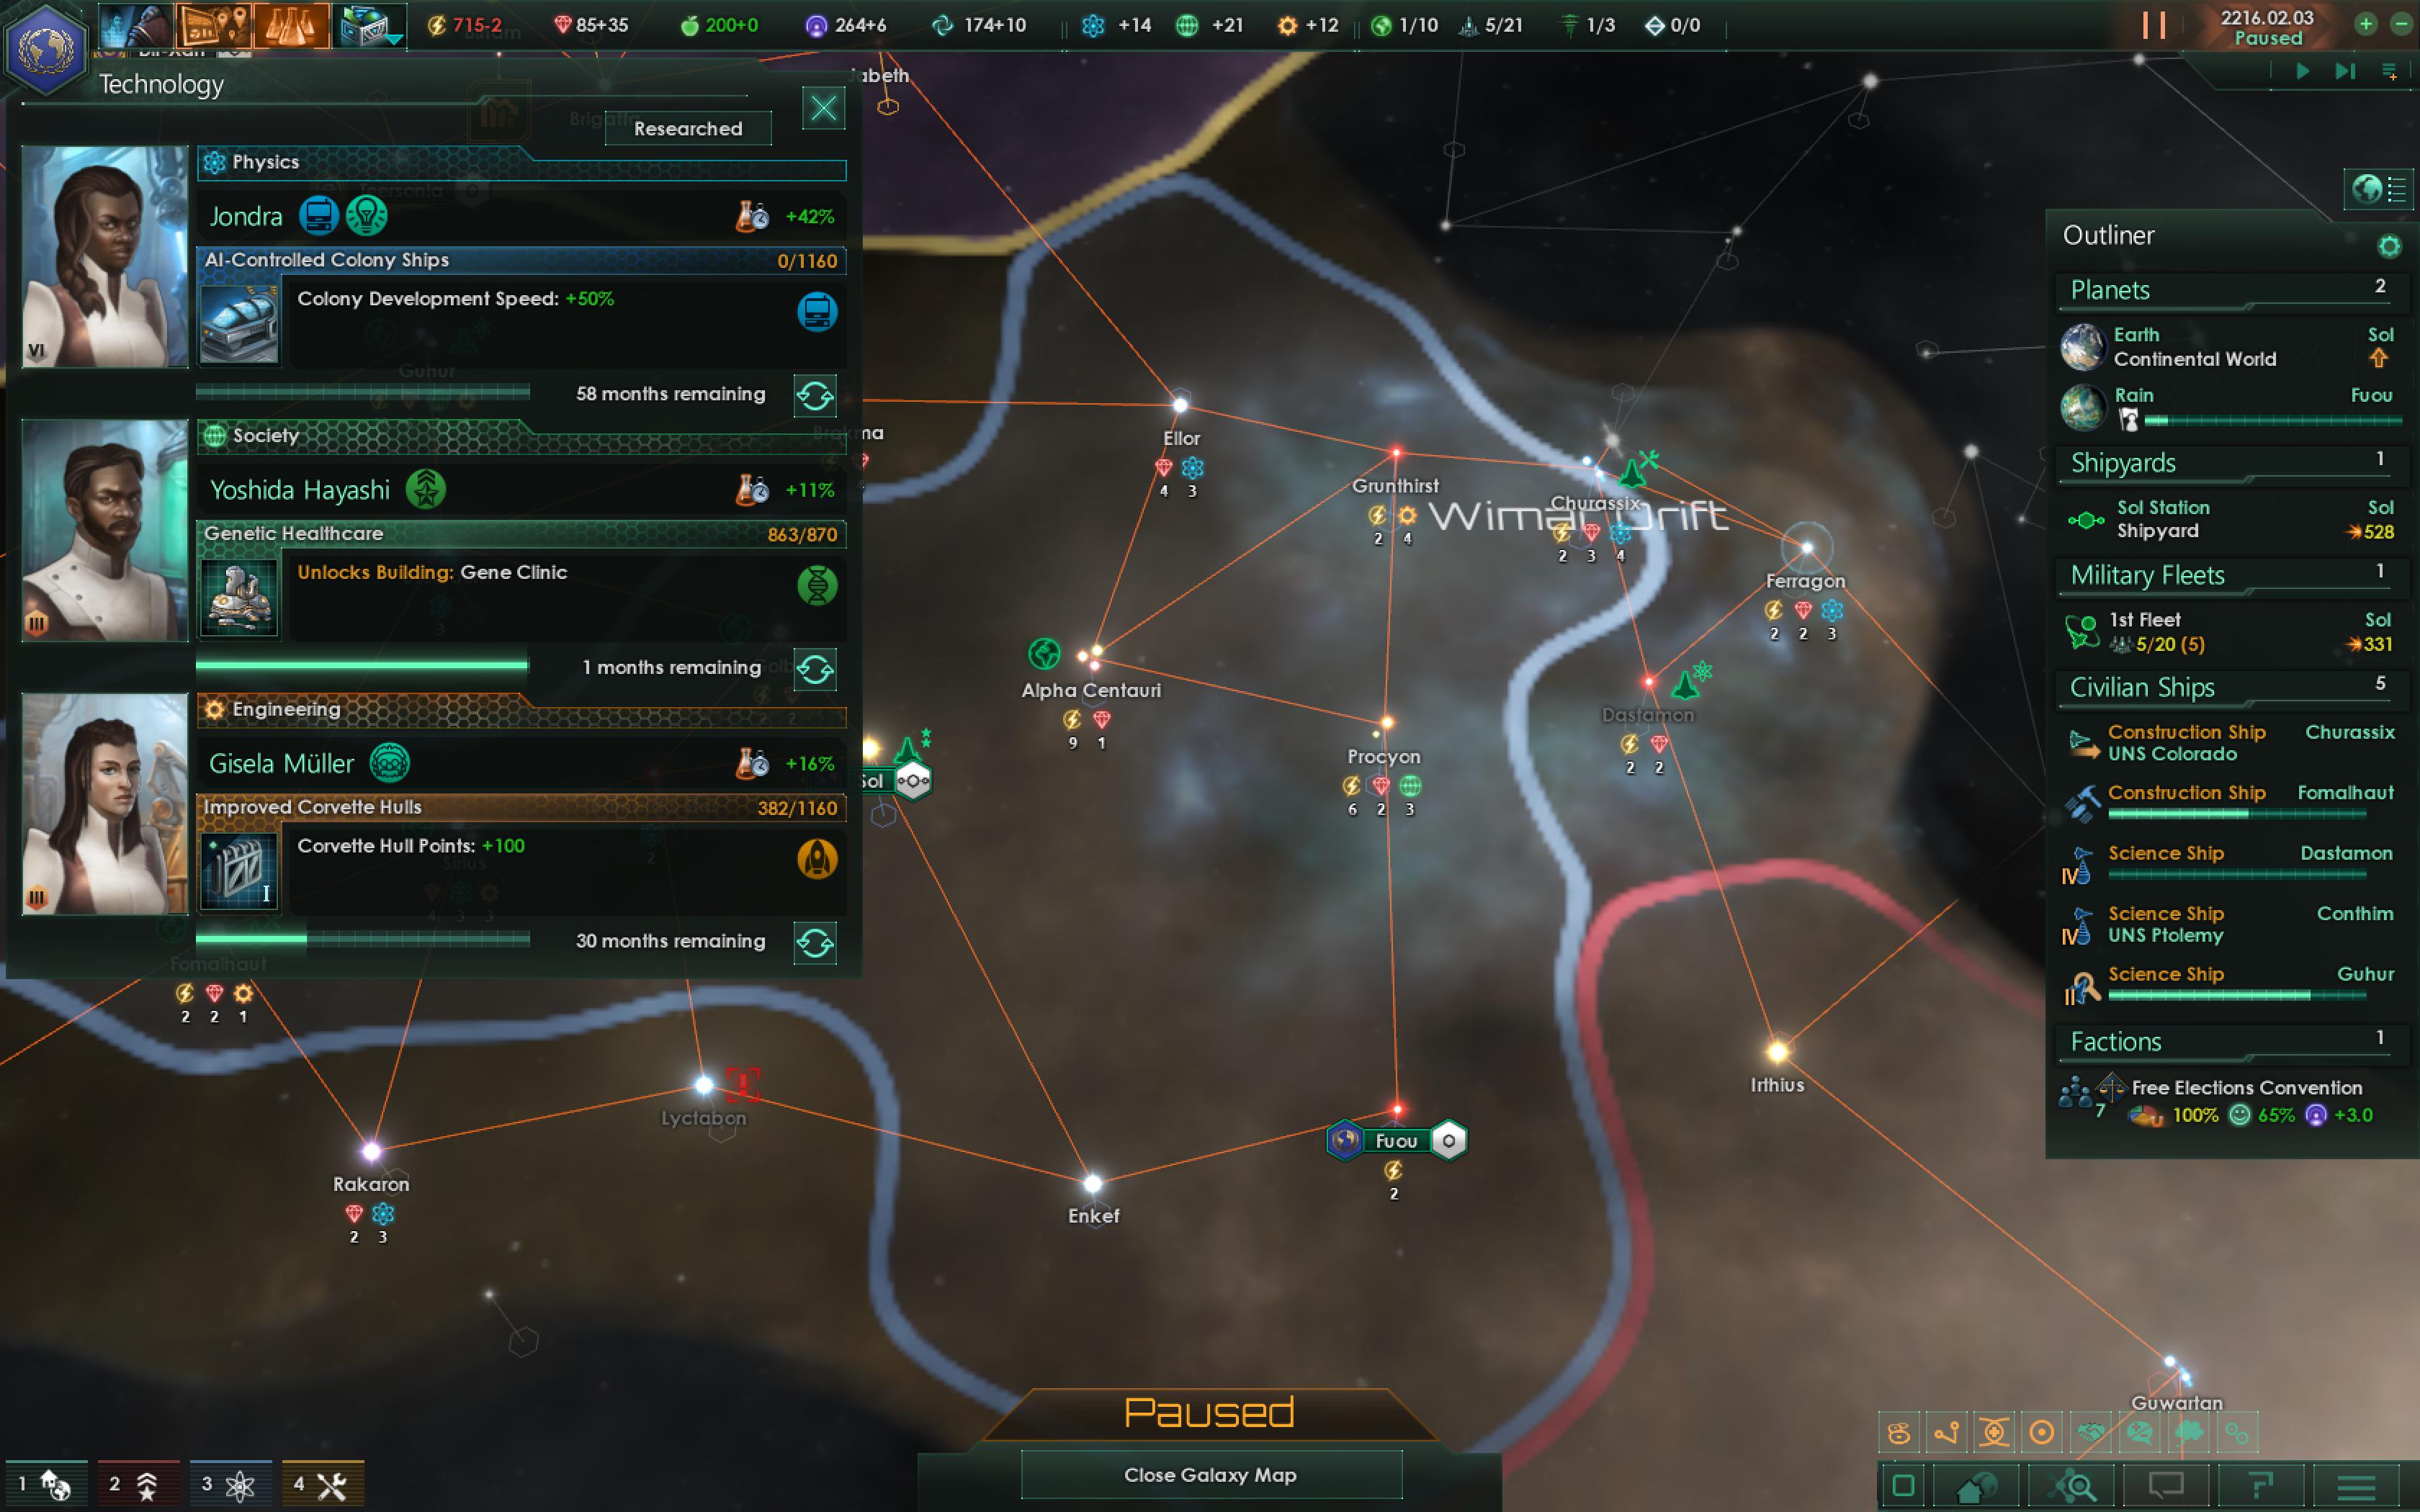 Galactic Civilizations - A Preset Empire AAR for Stellaris